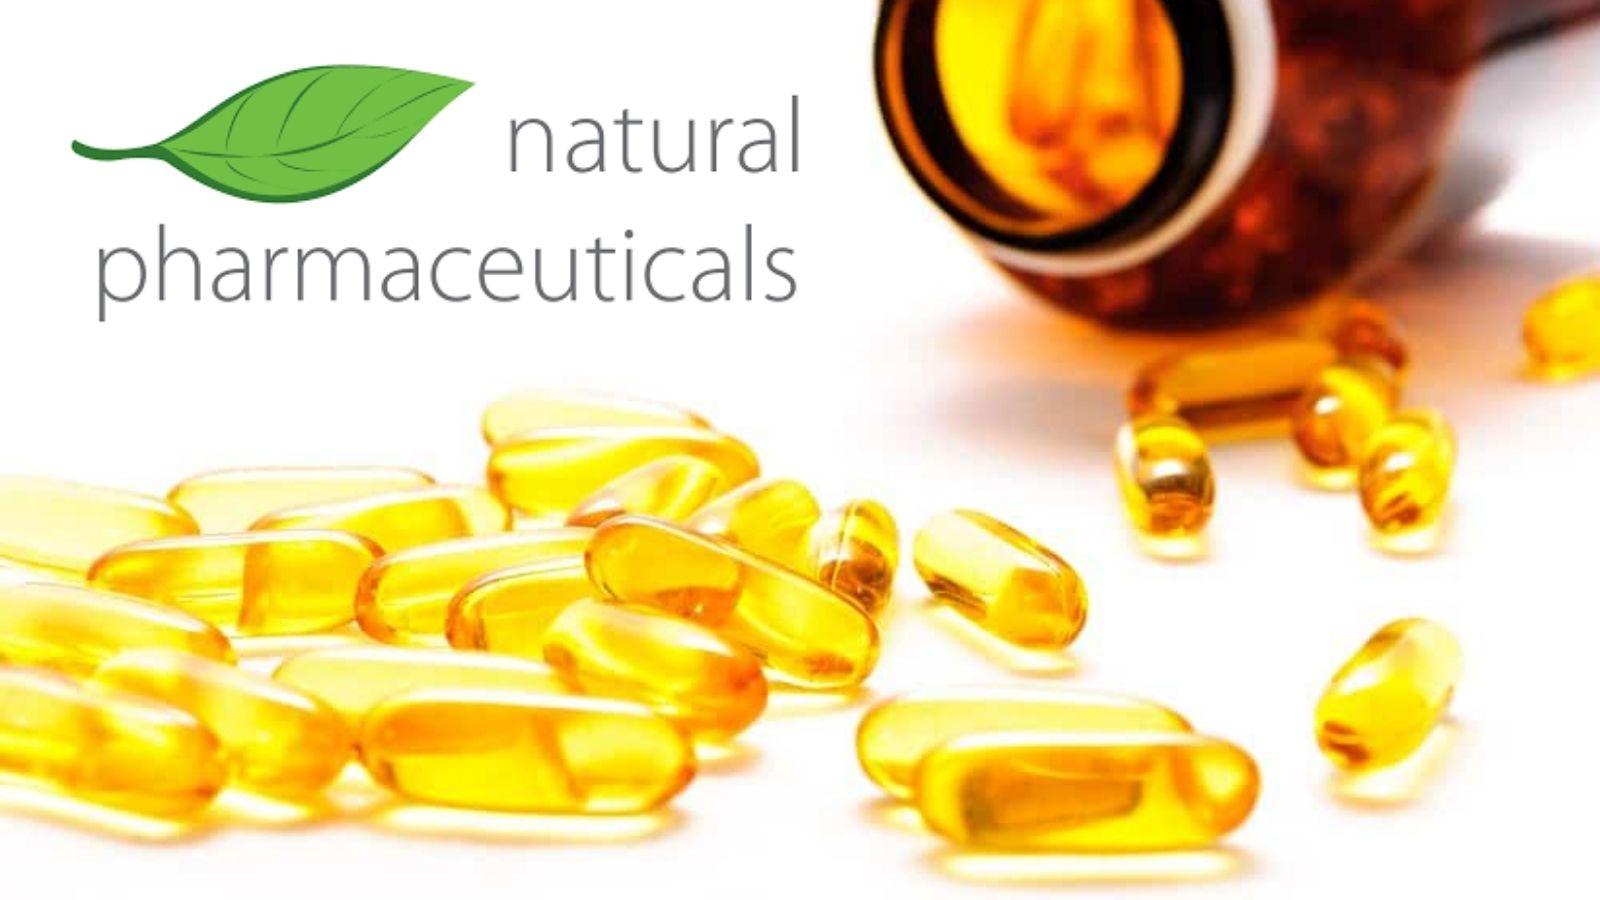 Natural Pharmaceuticals rozstrzygnął przetarg Havas Media Group mediarun natura